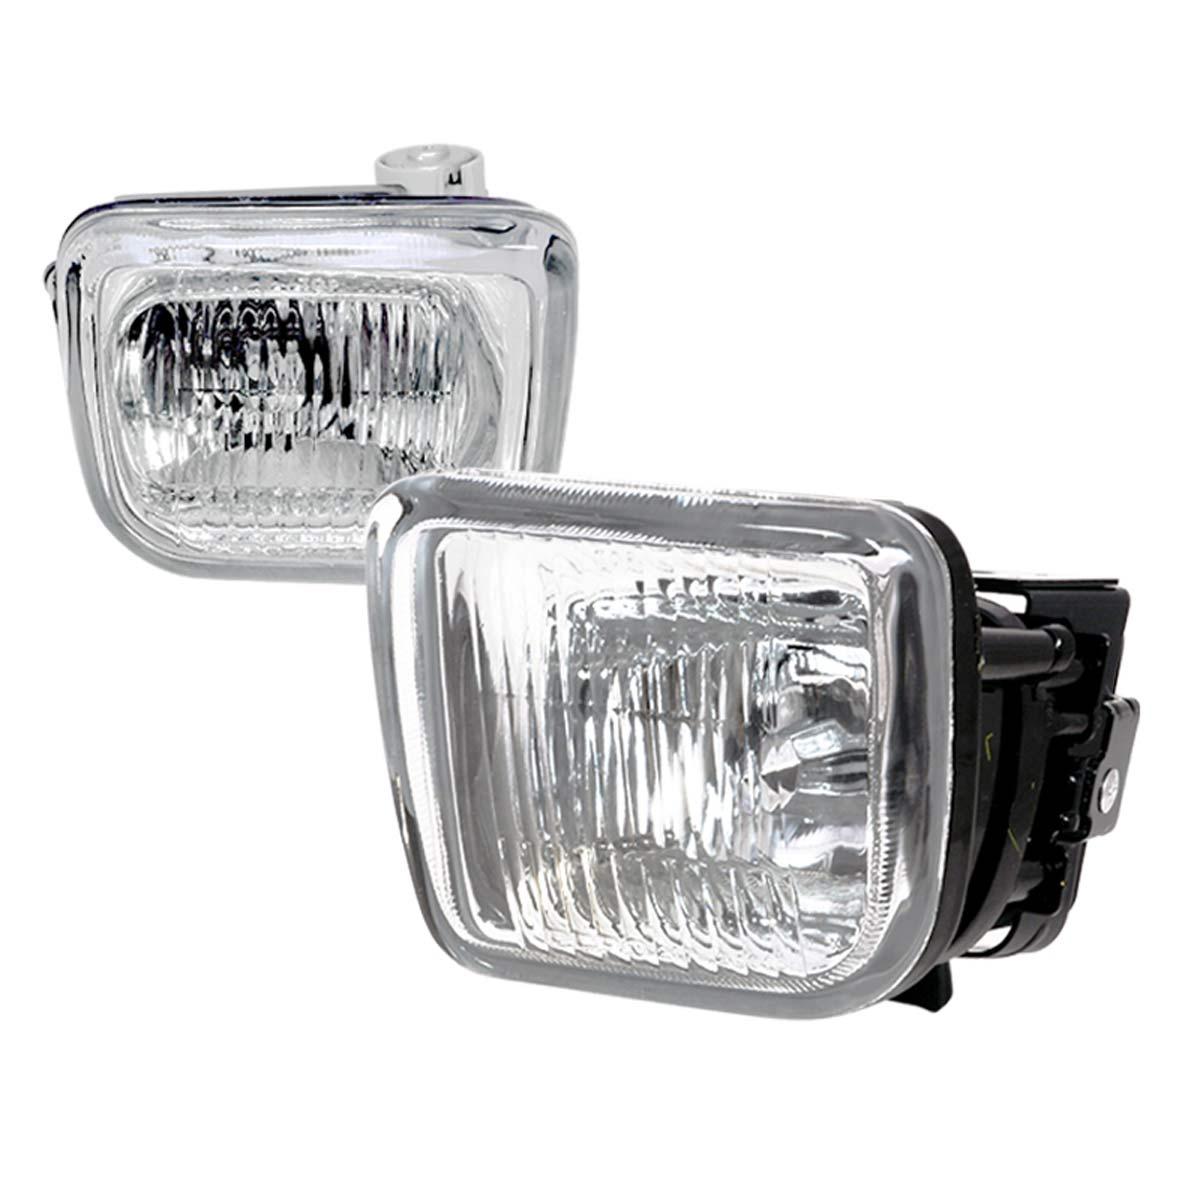 Spec-D Tuning LF-CV96COEM - Spec-D 96-98 Honda Civic Oem Clear Fog Lights